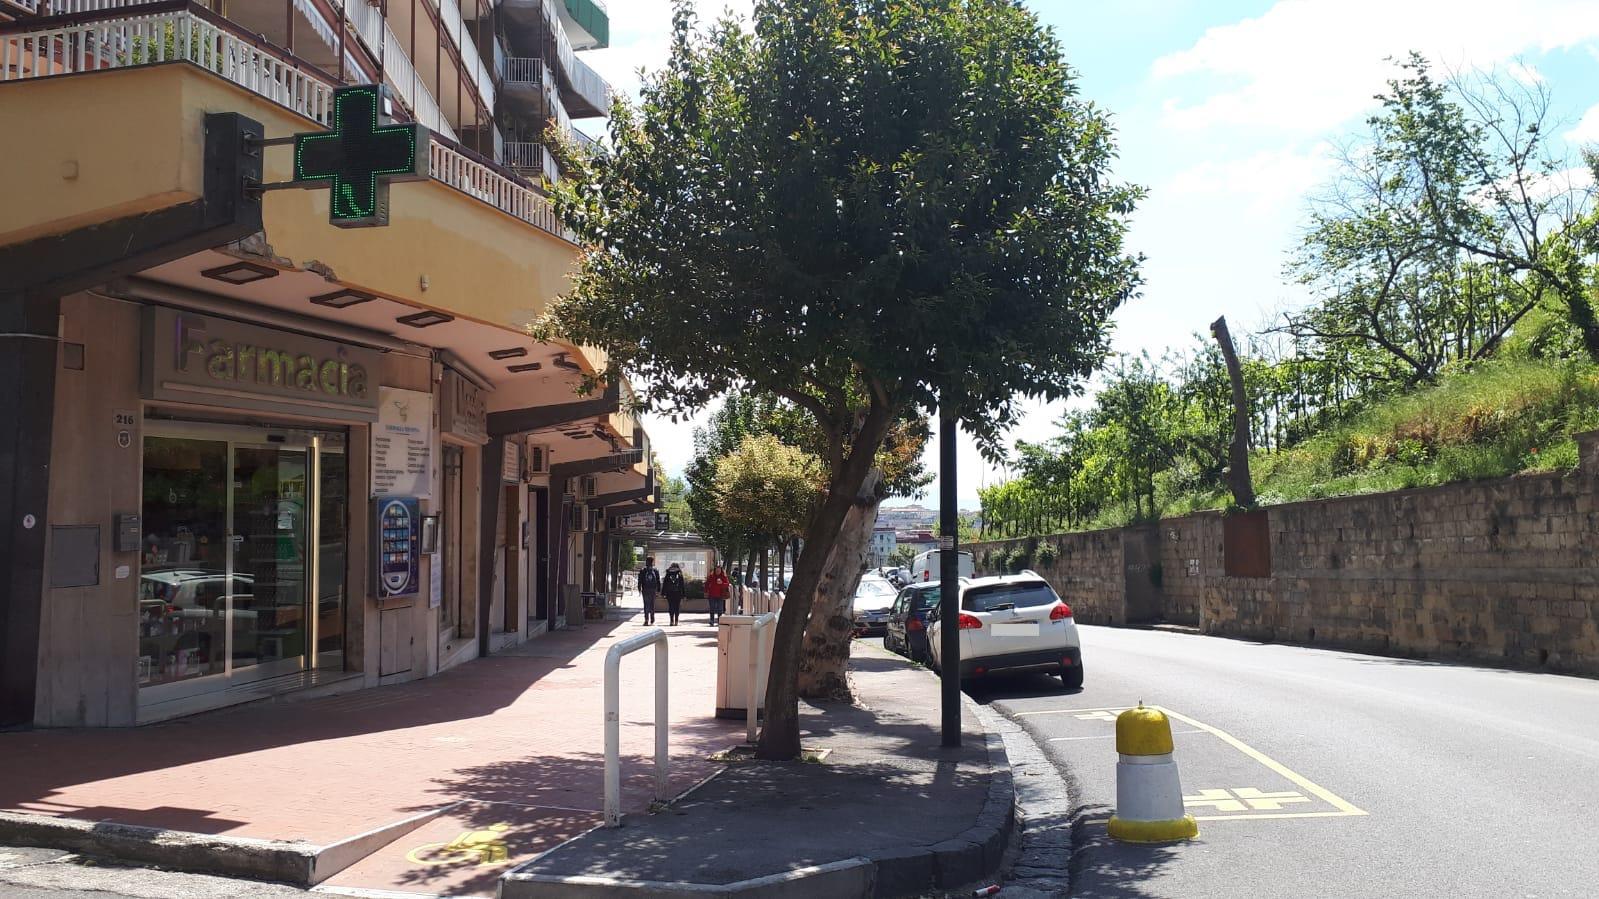 Farmacia Messina Napoli